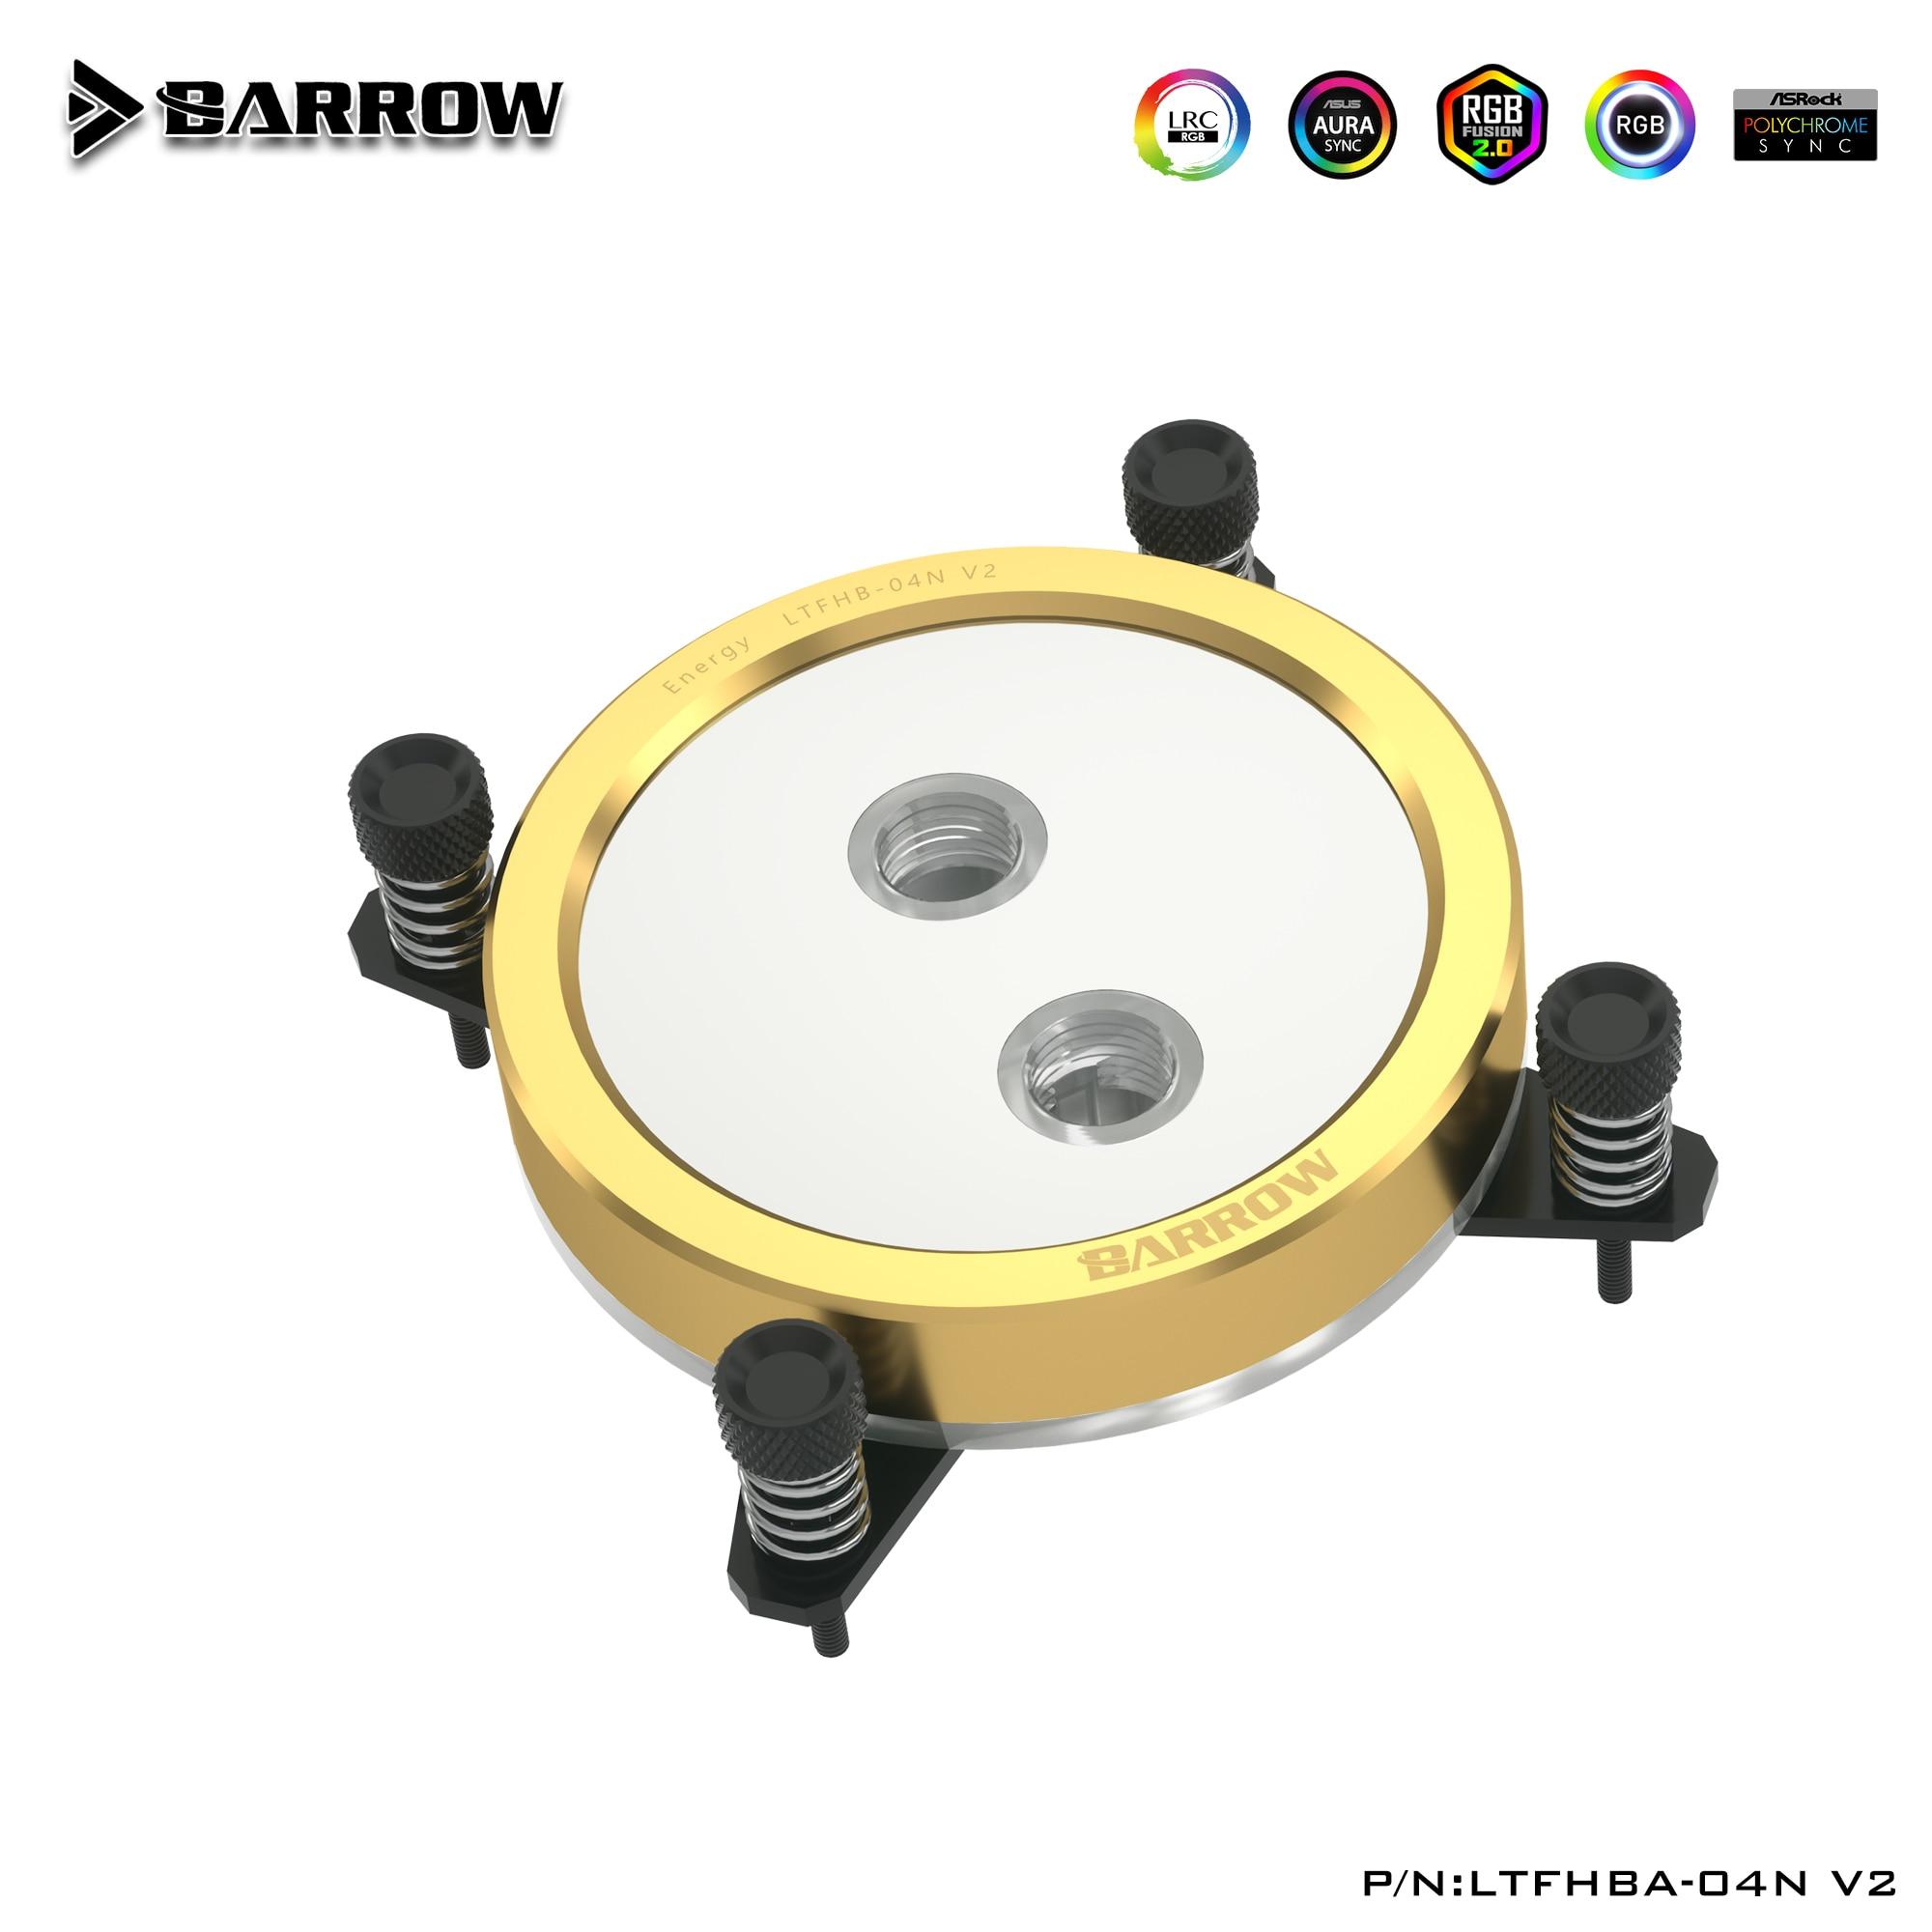 Barrow Gold CPU Water Block for INTEL LGA1150 1151 1155 1156 1200/ X99 2011 / AMD AM3 AM4/ radiator CPU water cooling LTFHB-04N